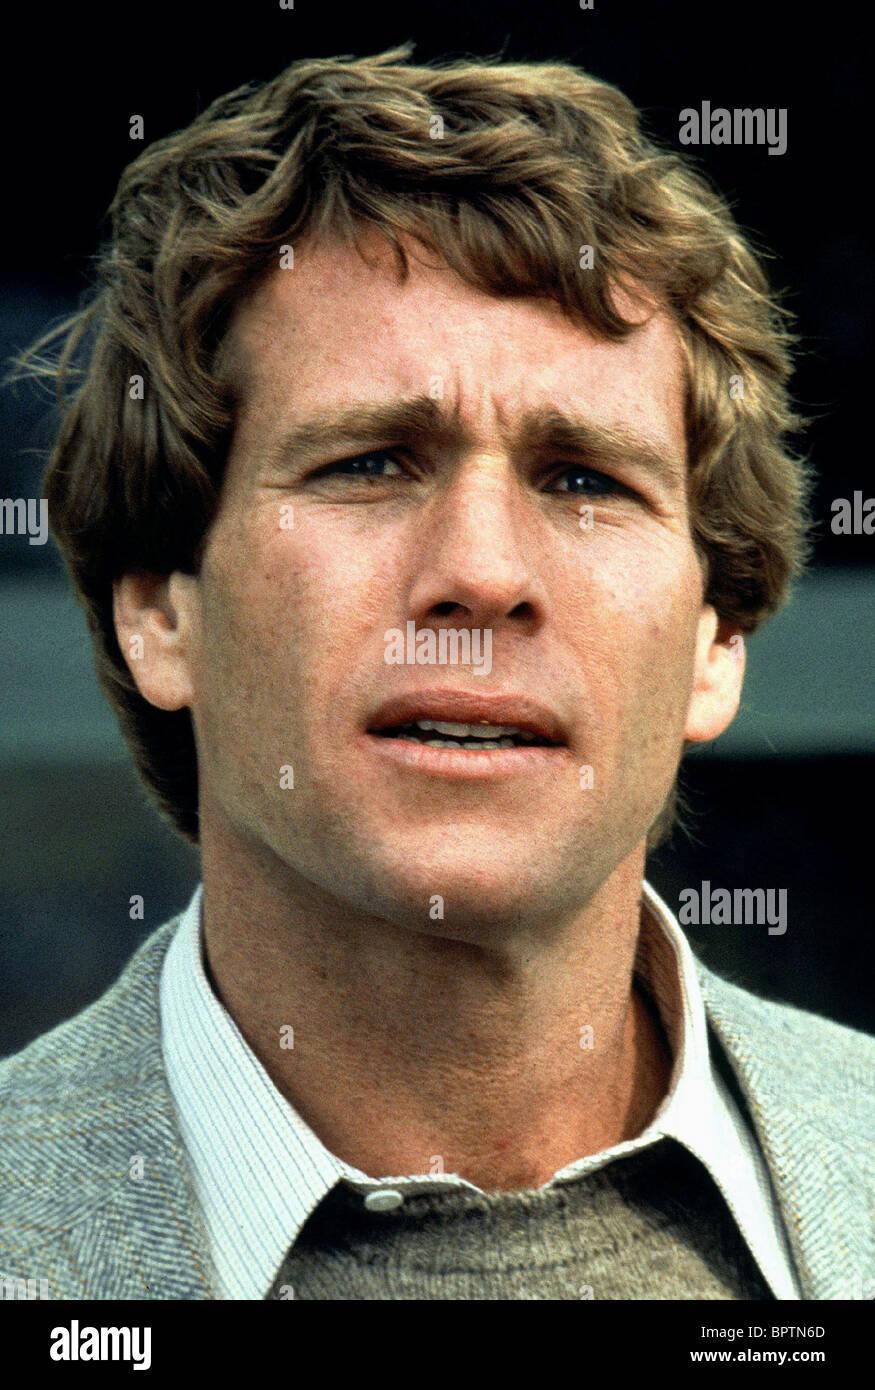 RYAN O'NEAL ACTOR (1977) - Stock Image